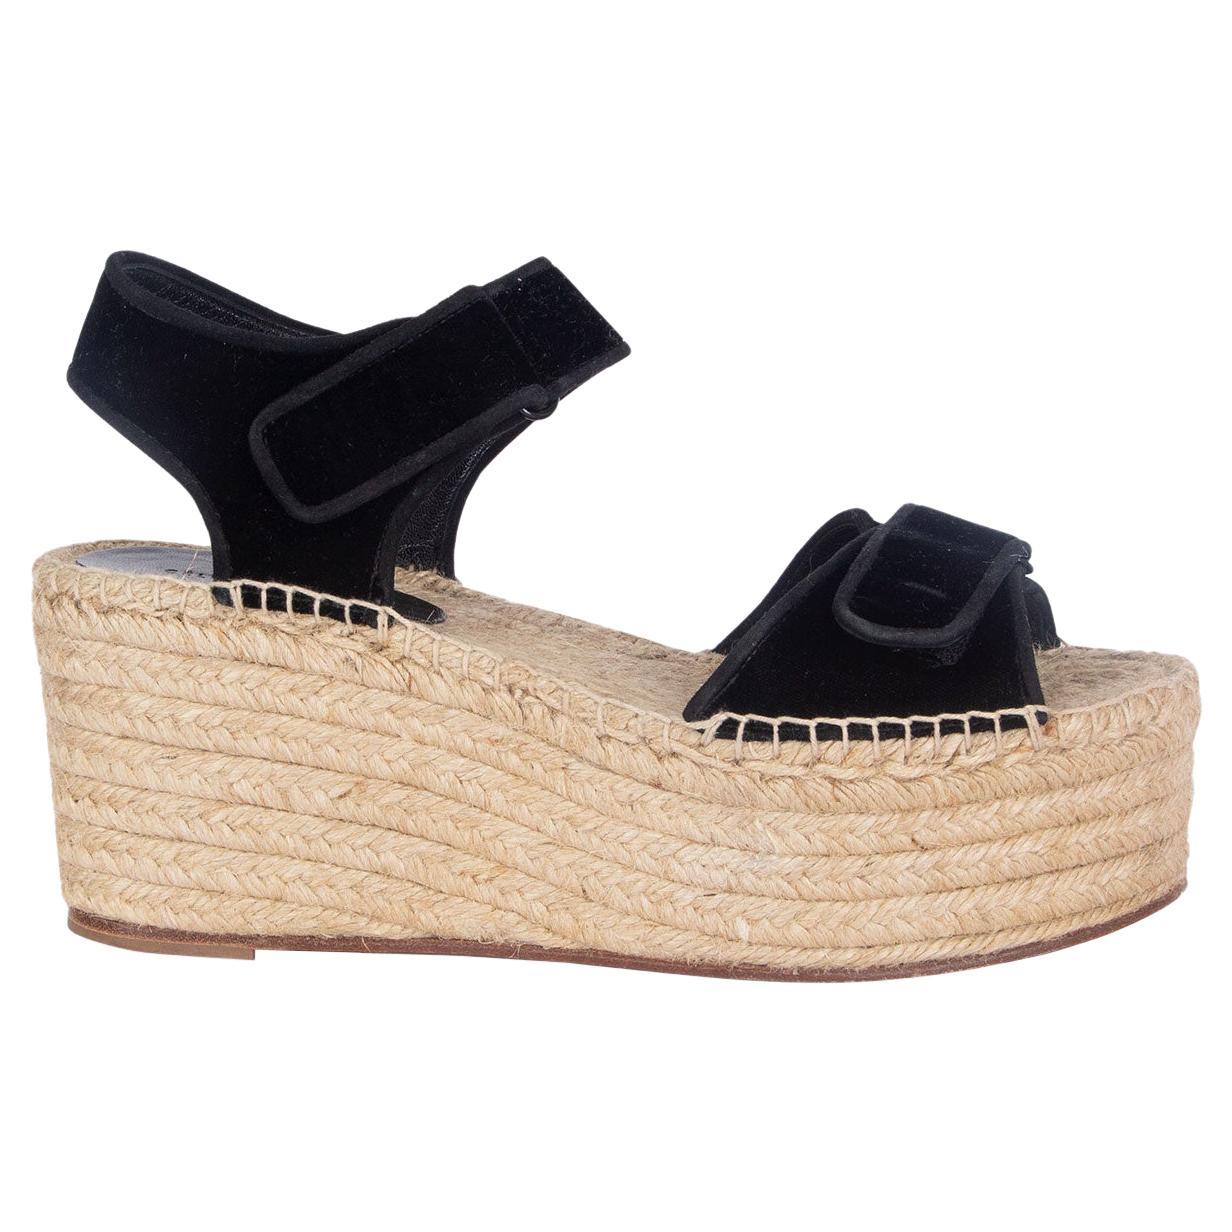 CELINE black velvet SCRATCH Velcro Espadrille Sandals Shoes 40